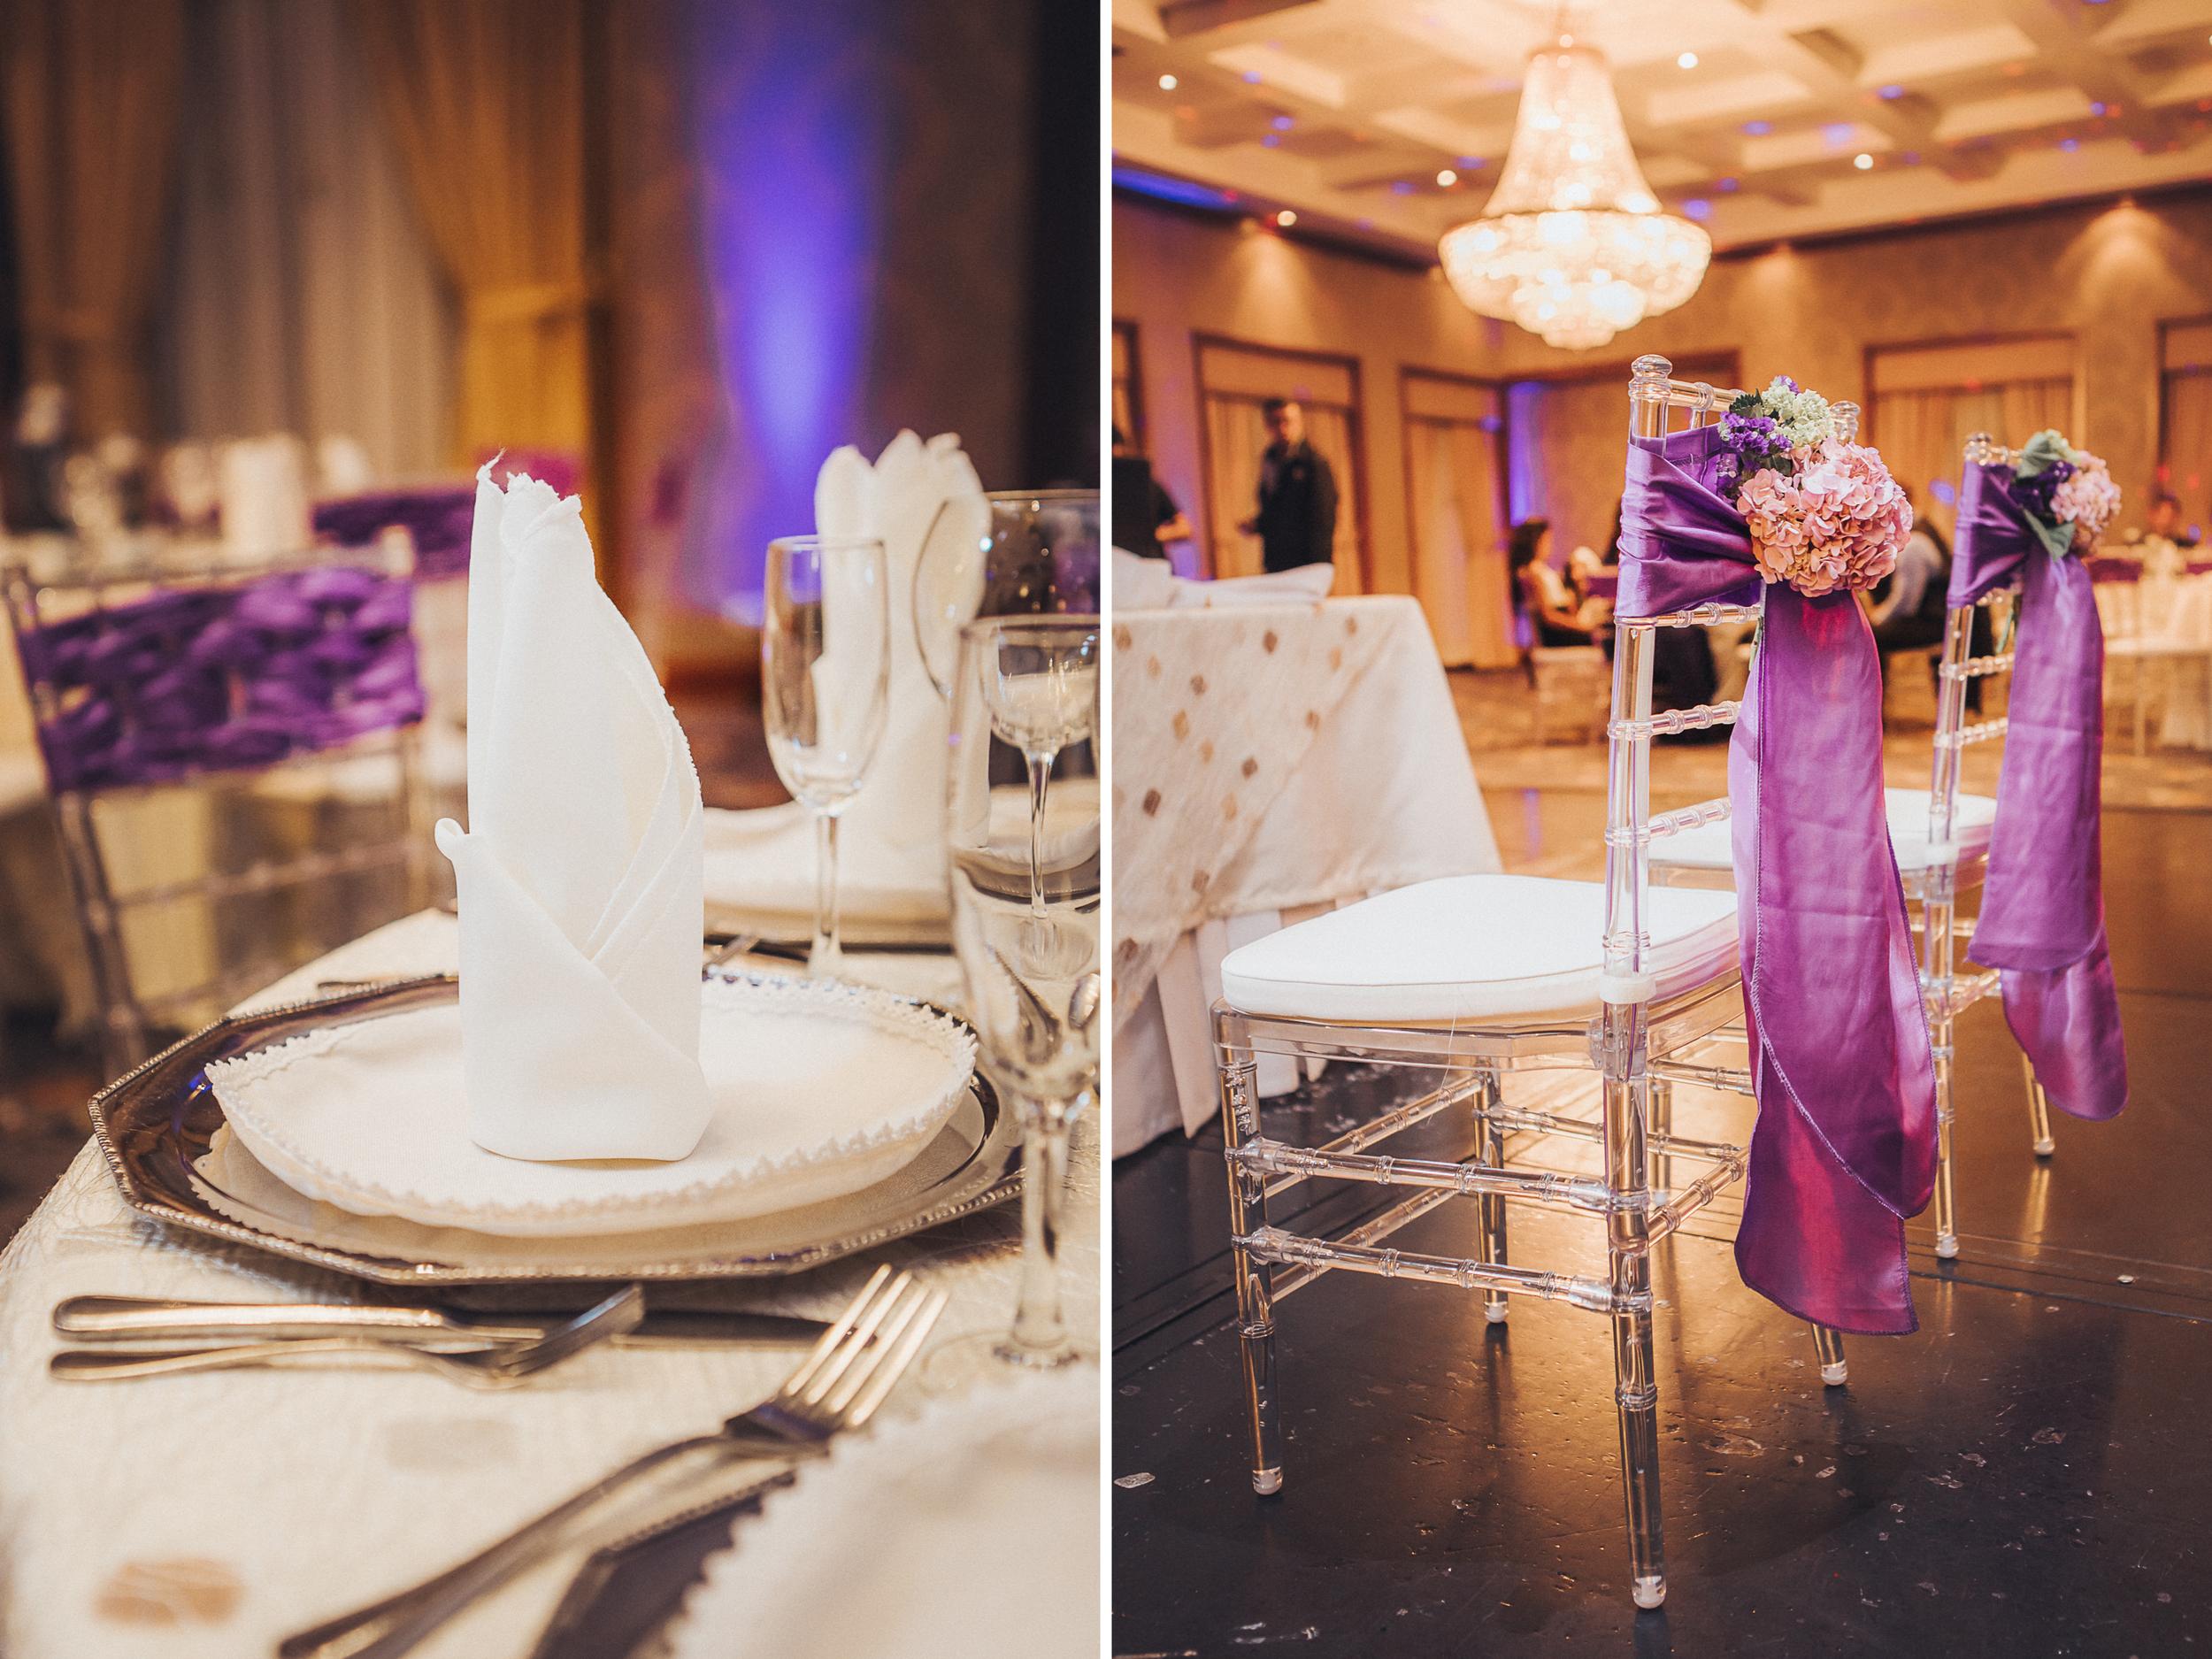 destination-wedding-decor-ideas-purple-hydrangeas-table-setting-photographer.jpg